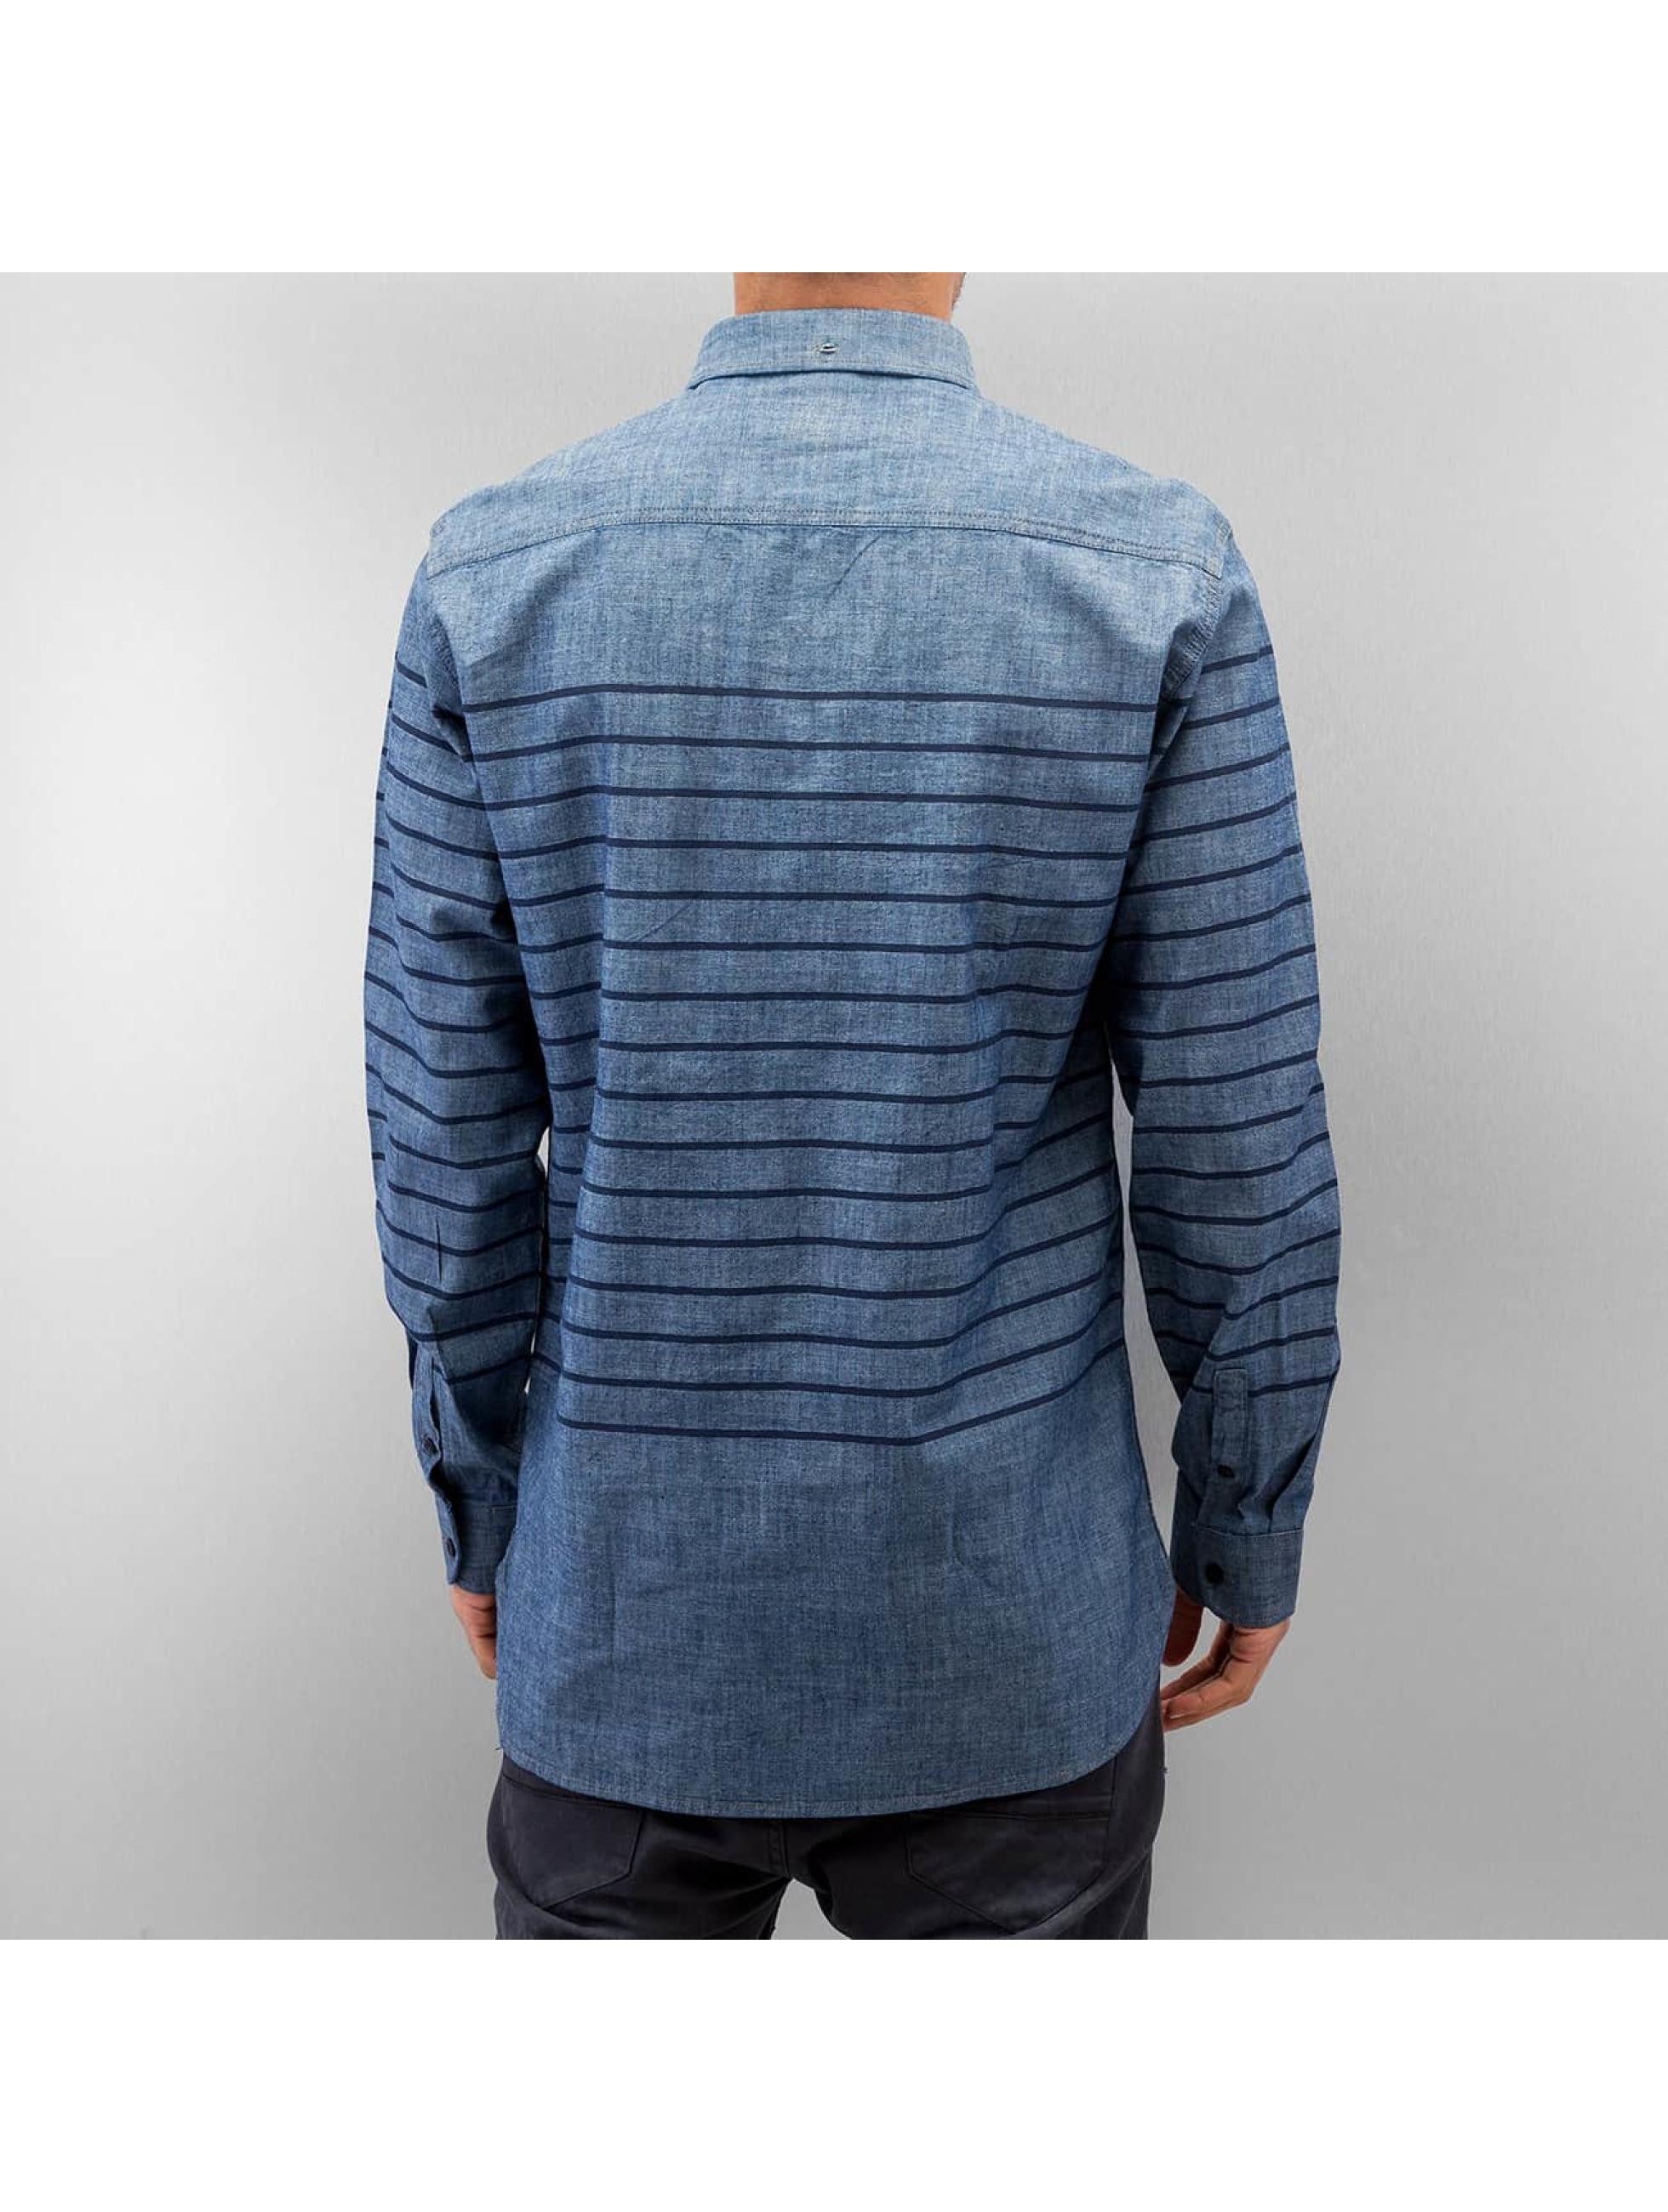 SHINE Original overhemd Striped Chambray blauw